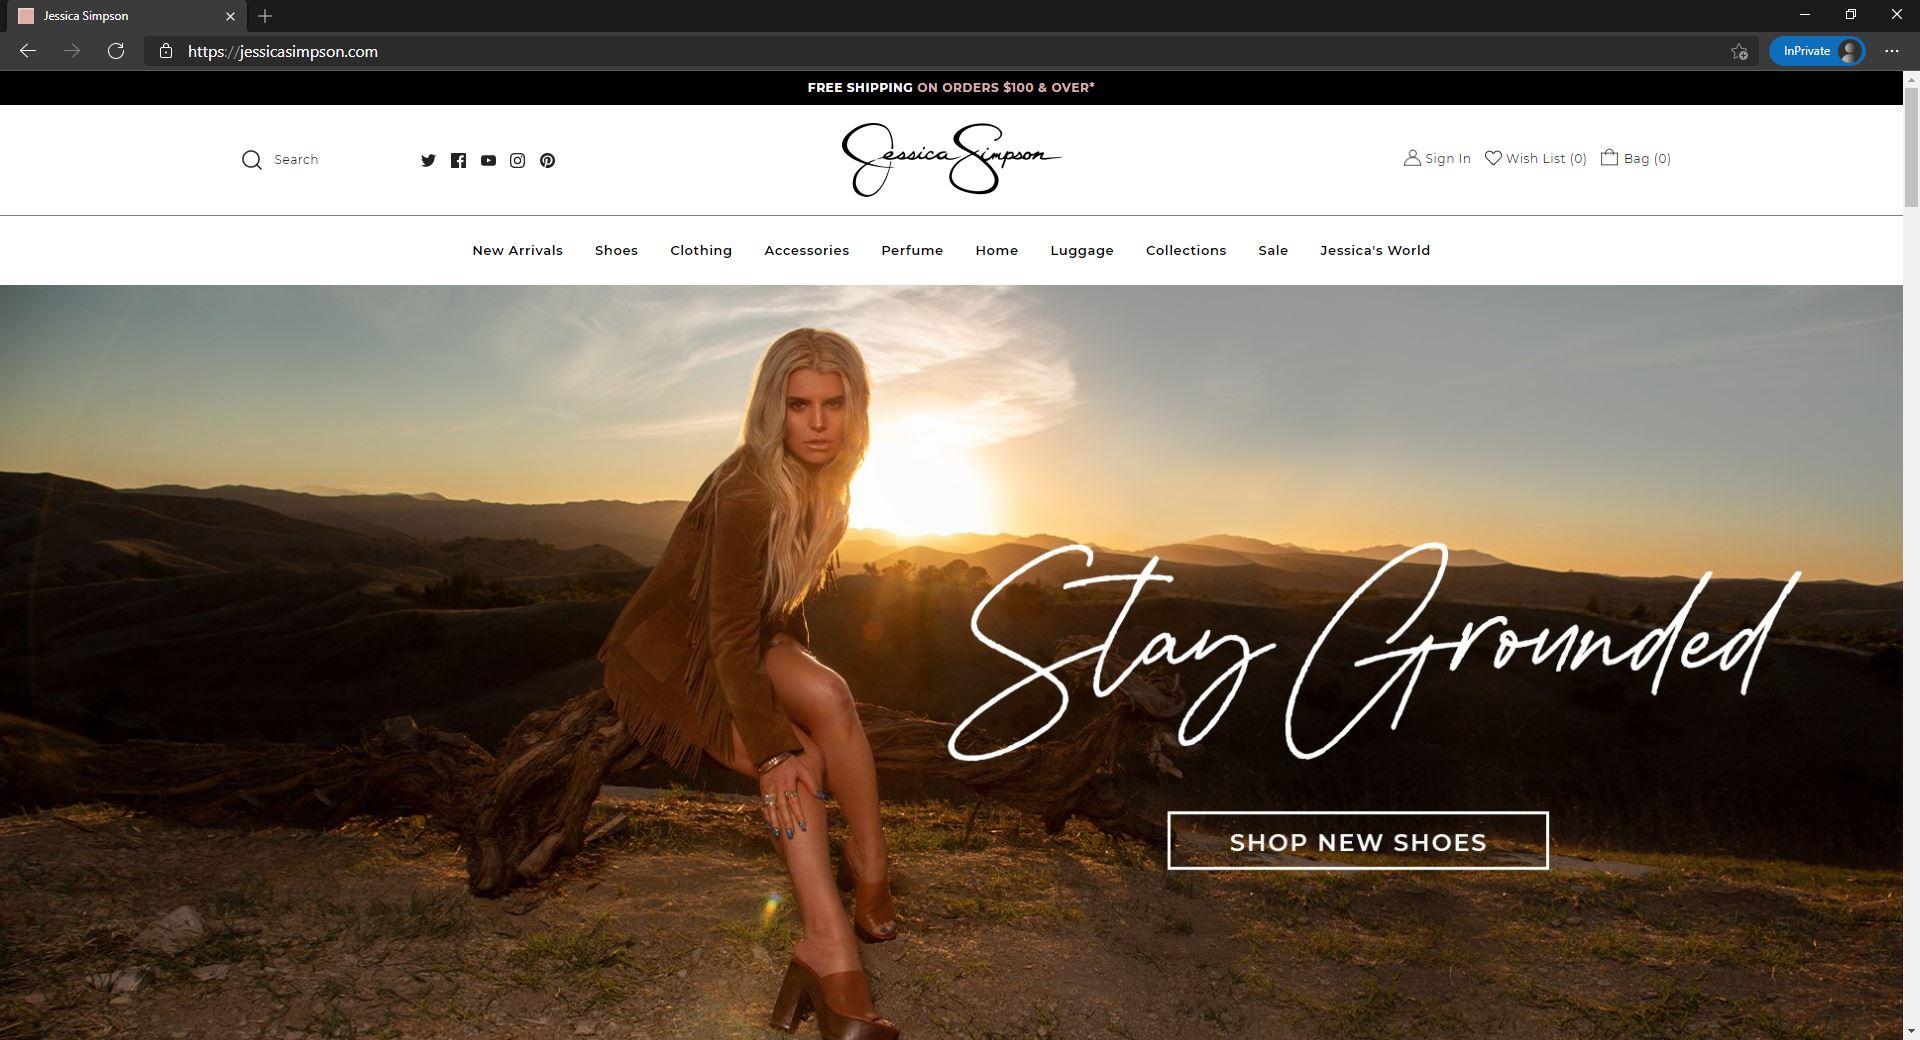 Jessica Simpson ecommerce store homepage